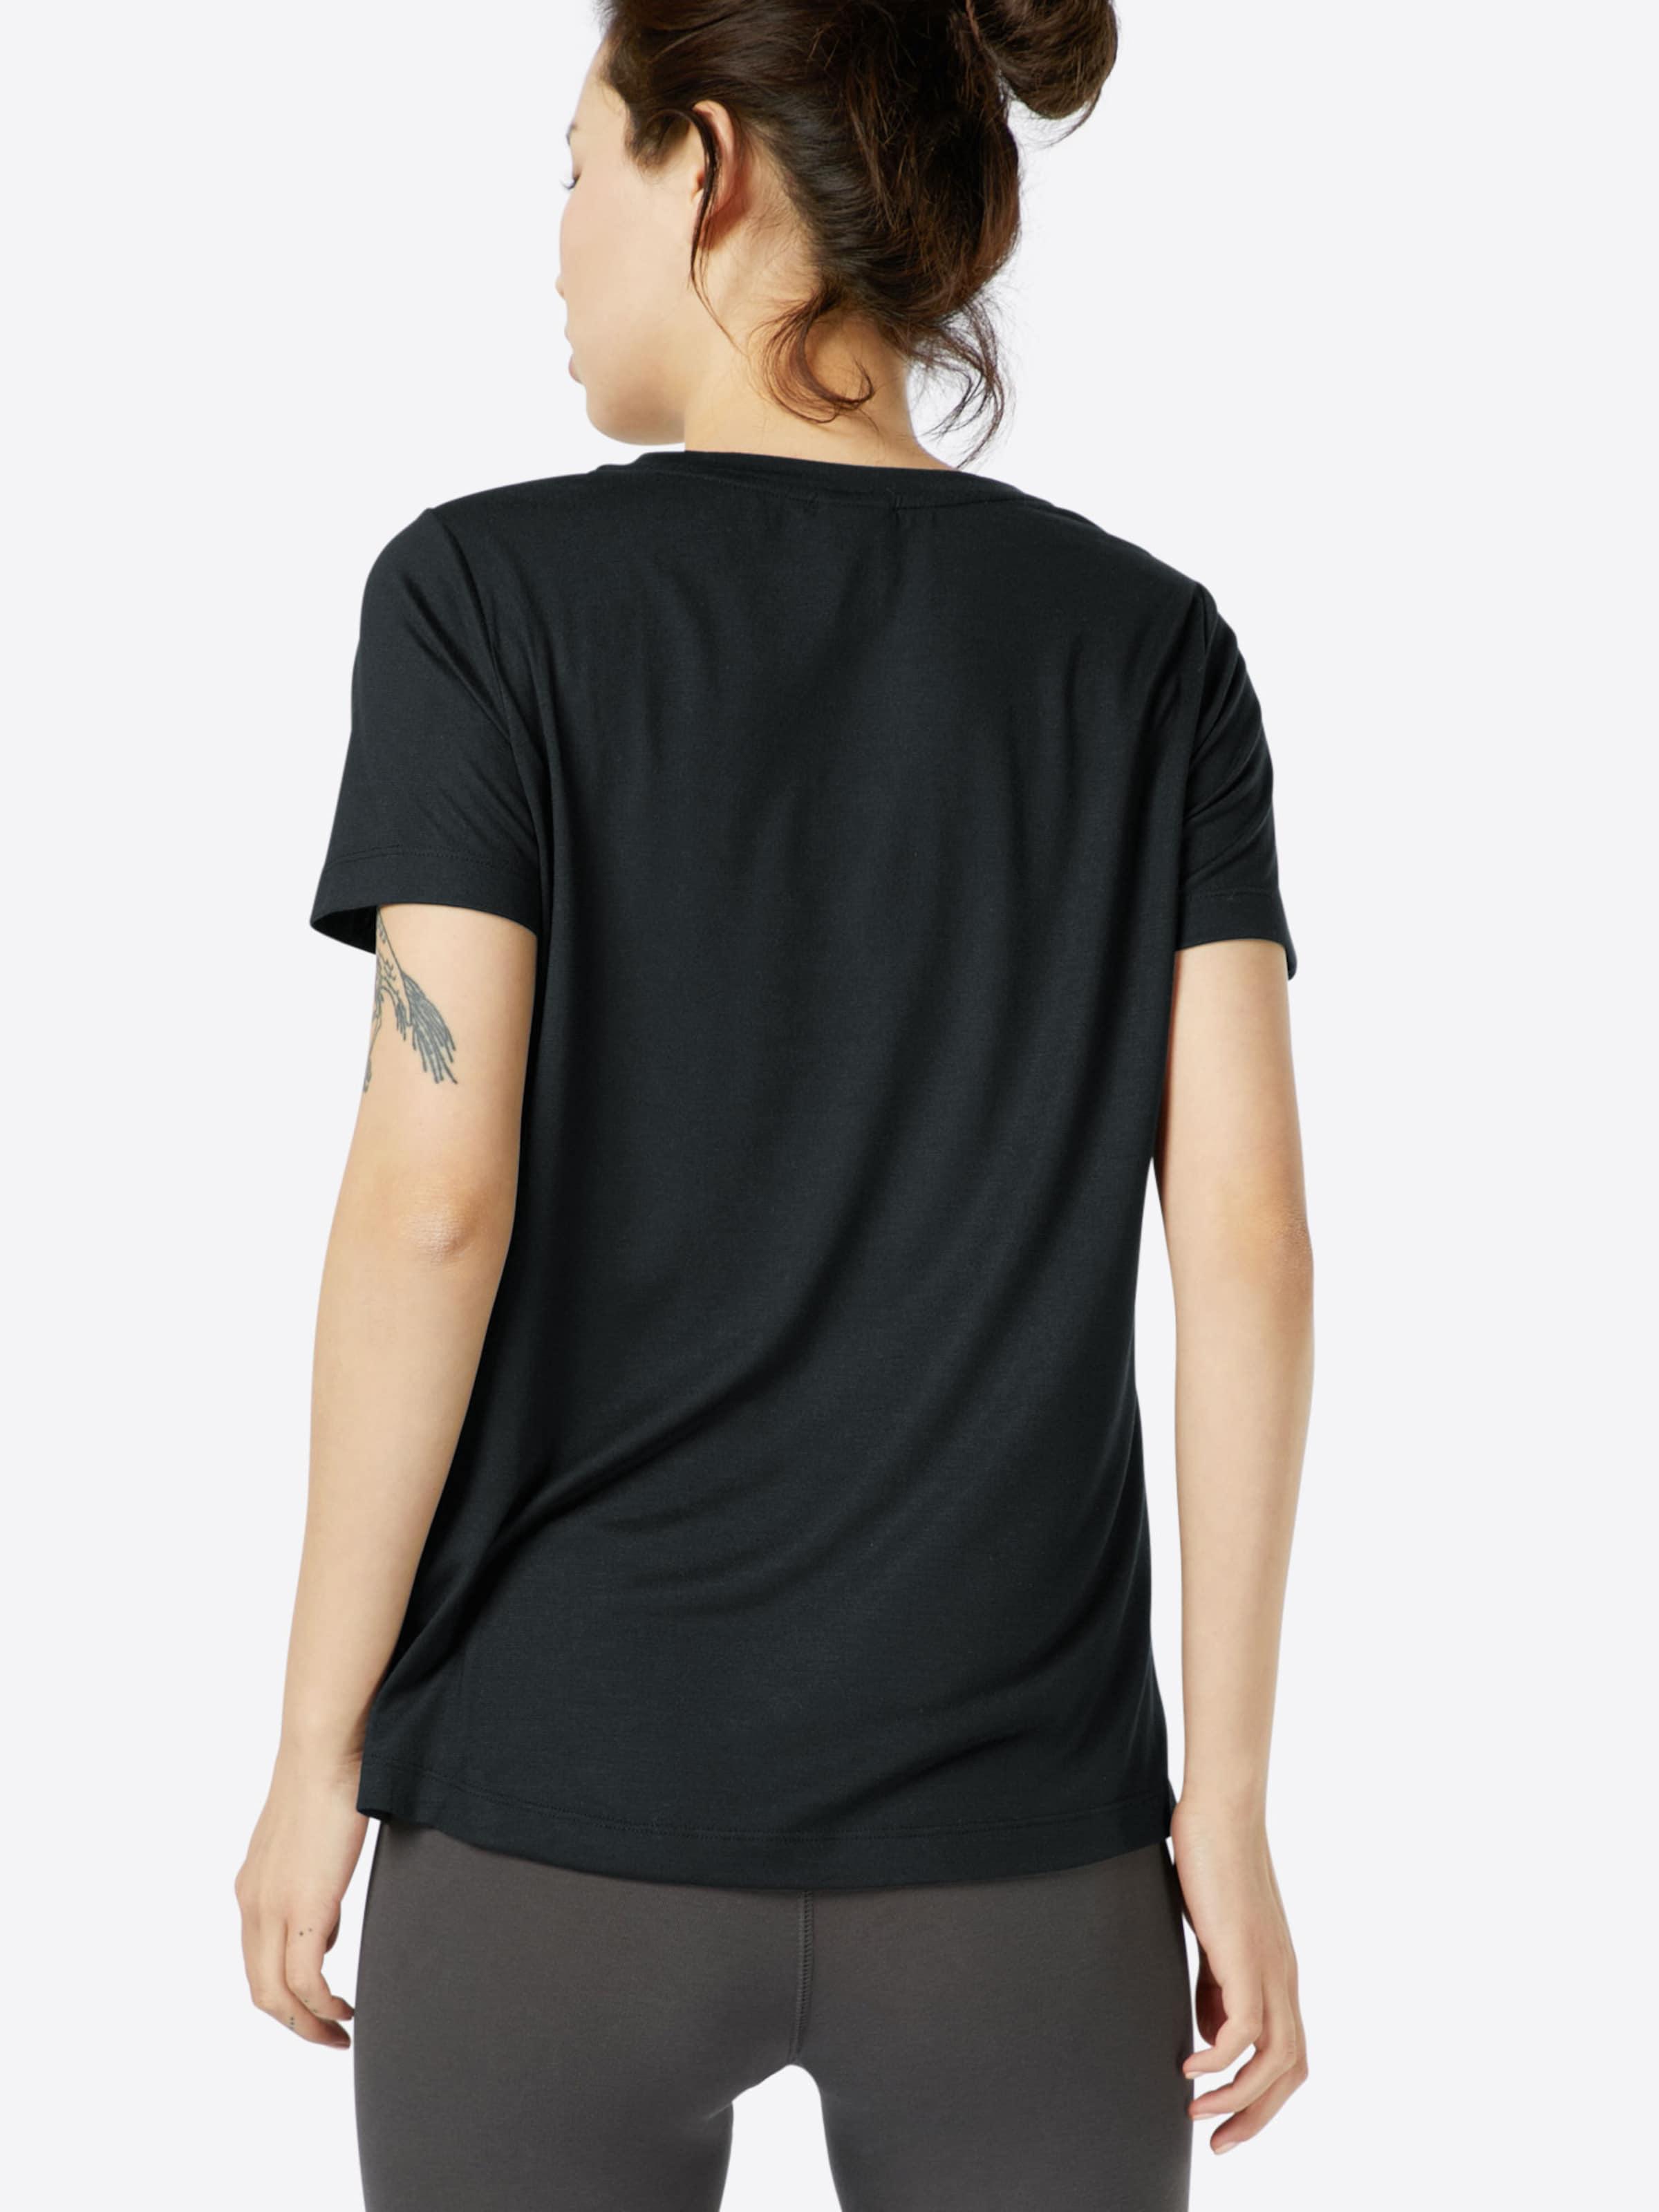 Nike Sportswear T-shirt 'Essential' Bester Lieferant HmKRN